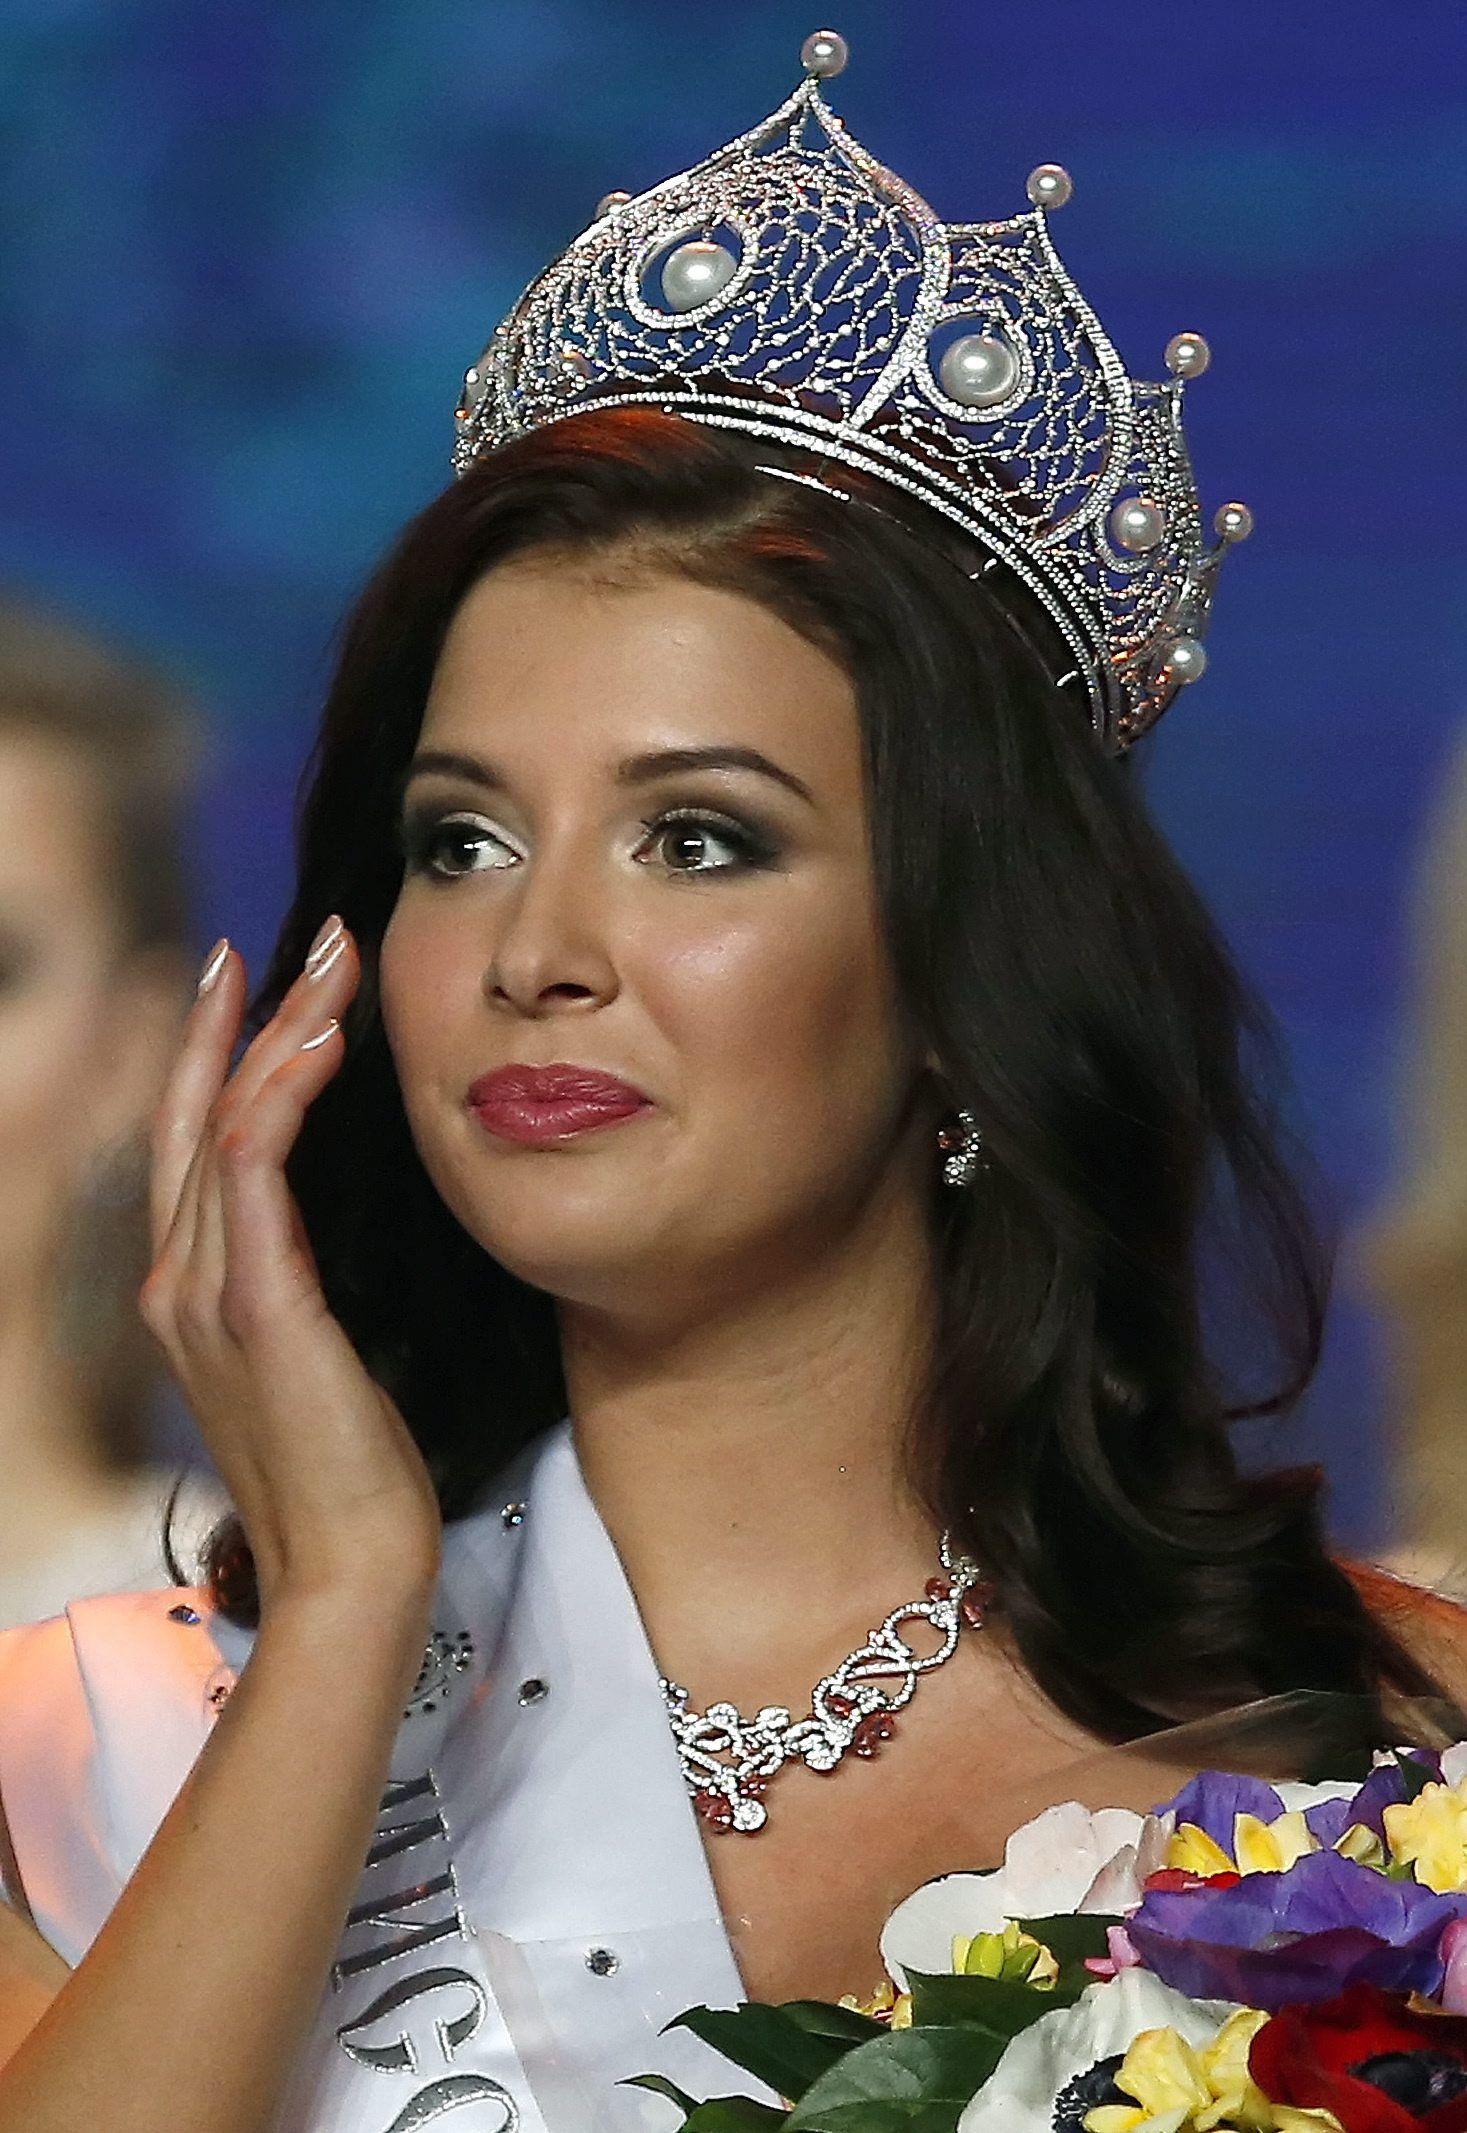 Sofia Nikitchuk / Miss Russia 2015 Beauty Contest